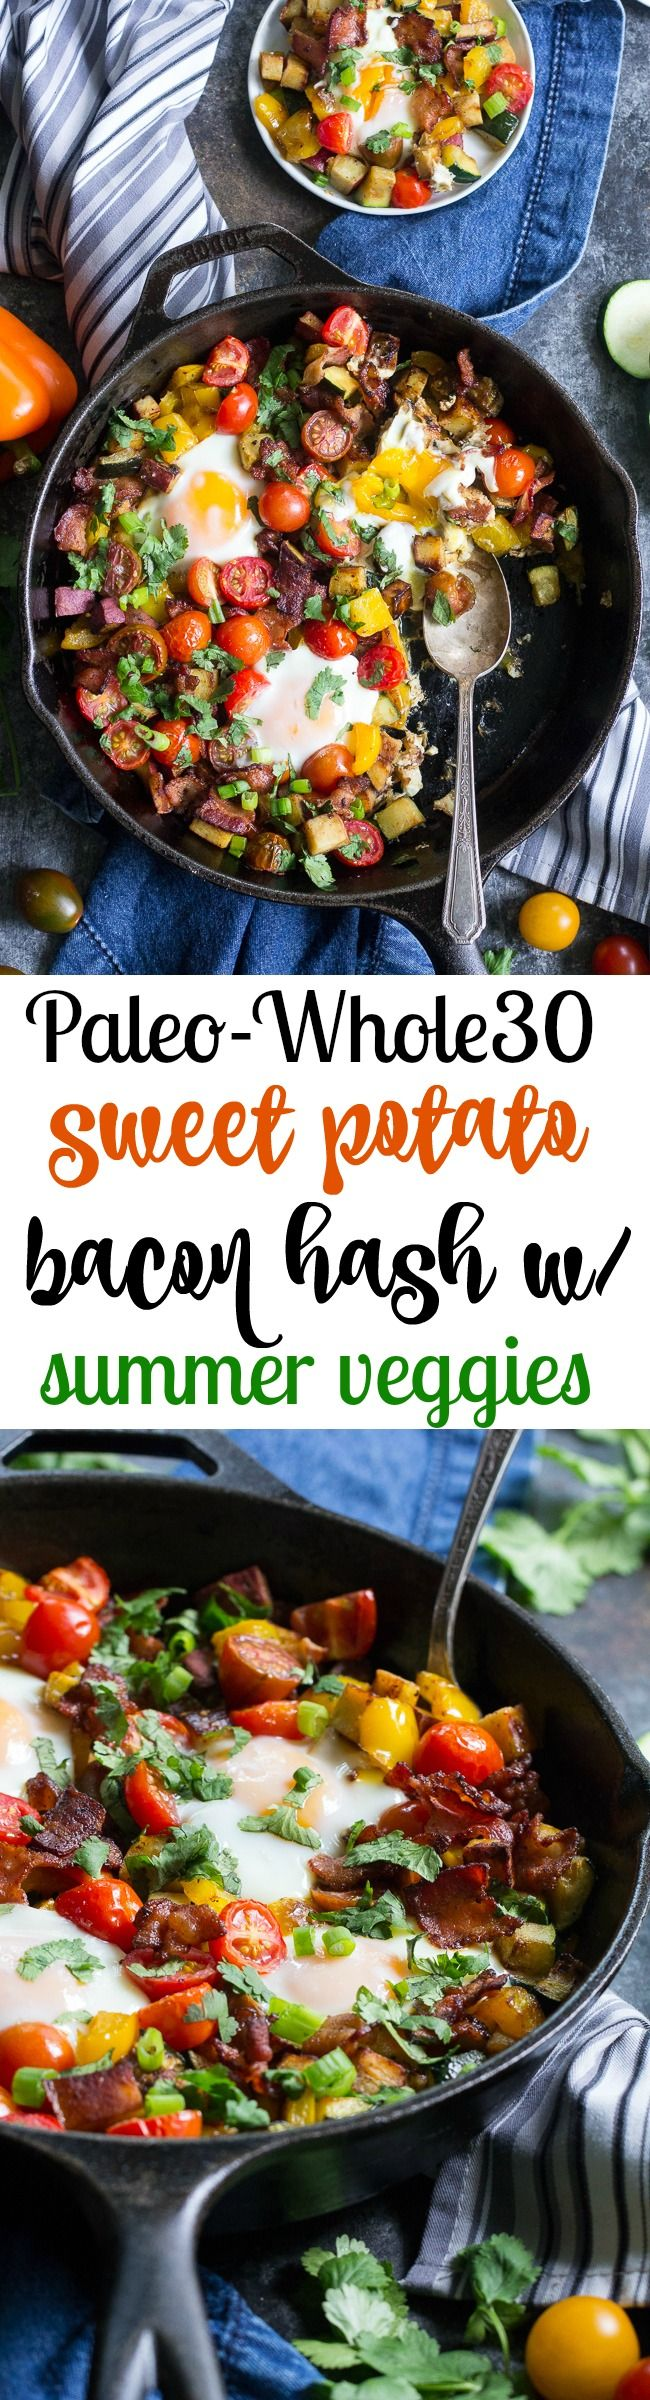 Sweet Potato Hash with Bacon and Summer Veggies {Paleo & Whole30}   #justeatrealfood #paleorunningmomma